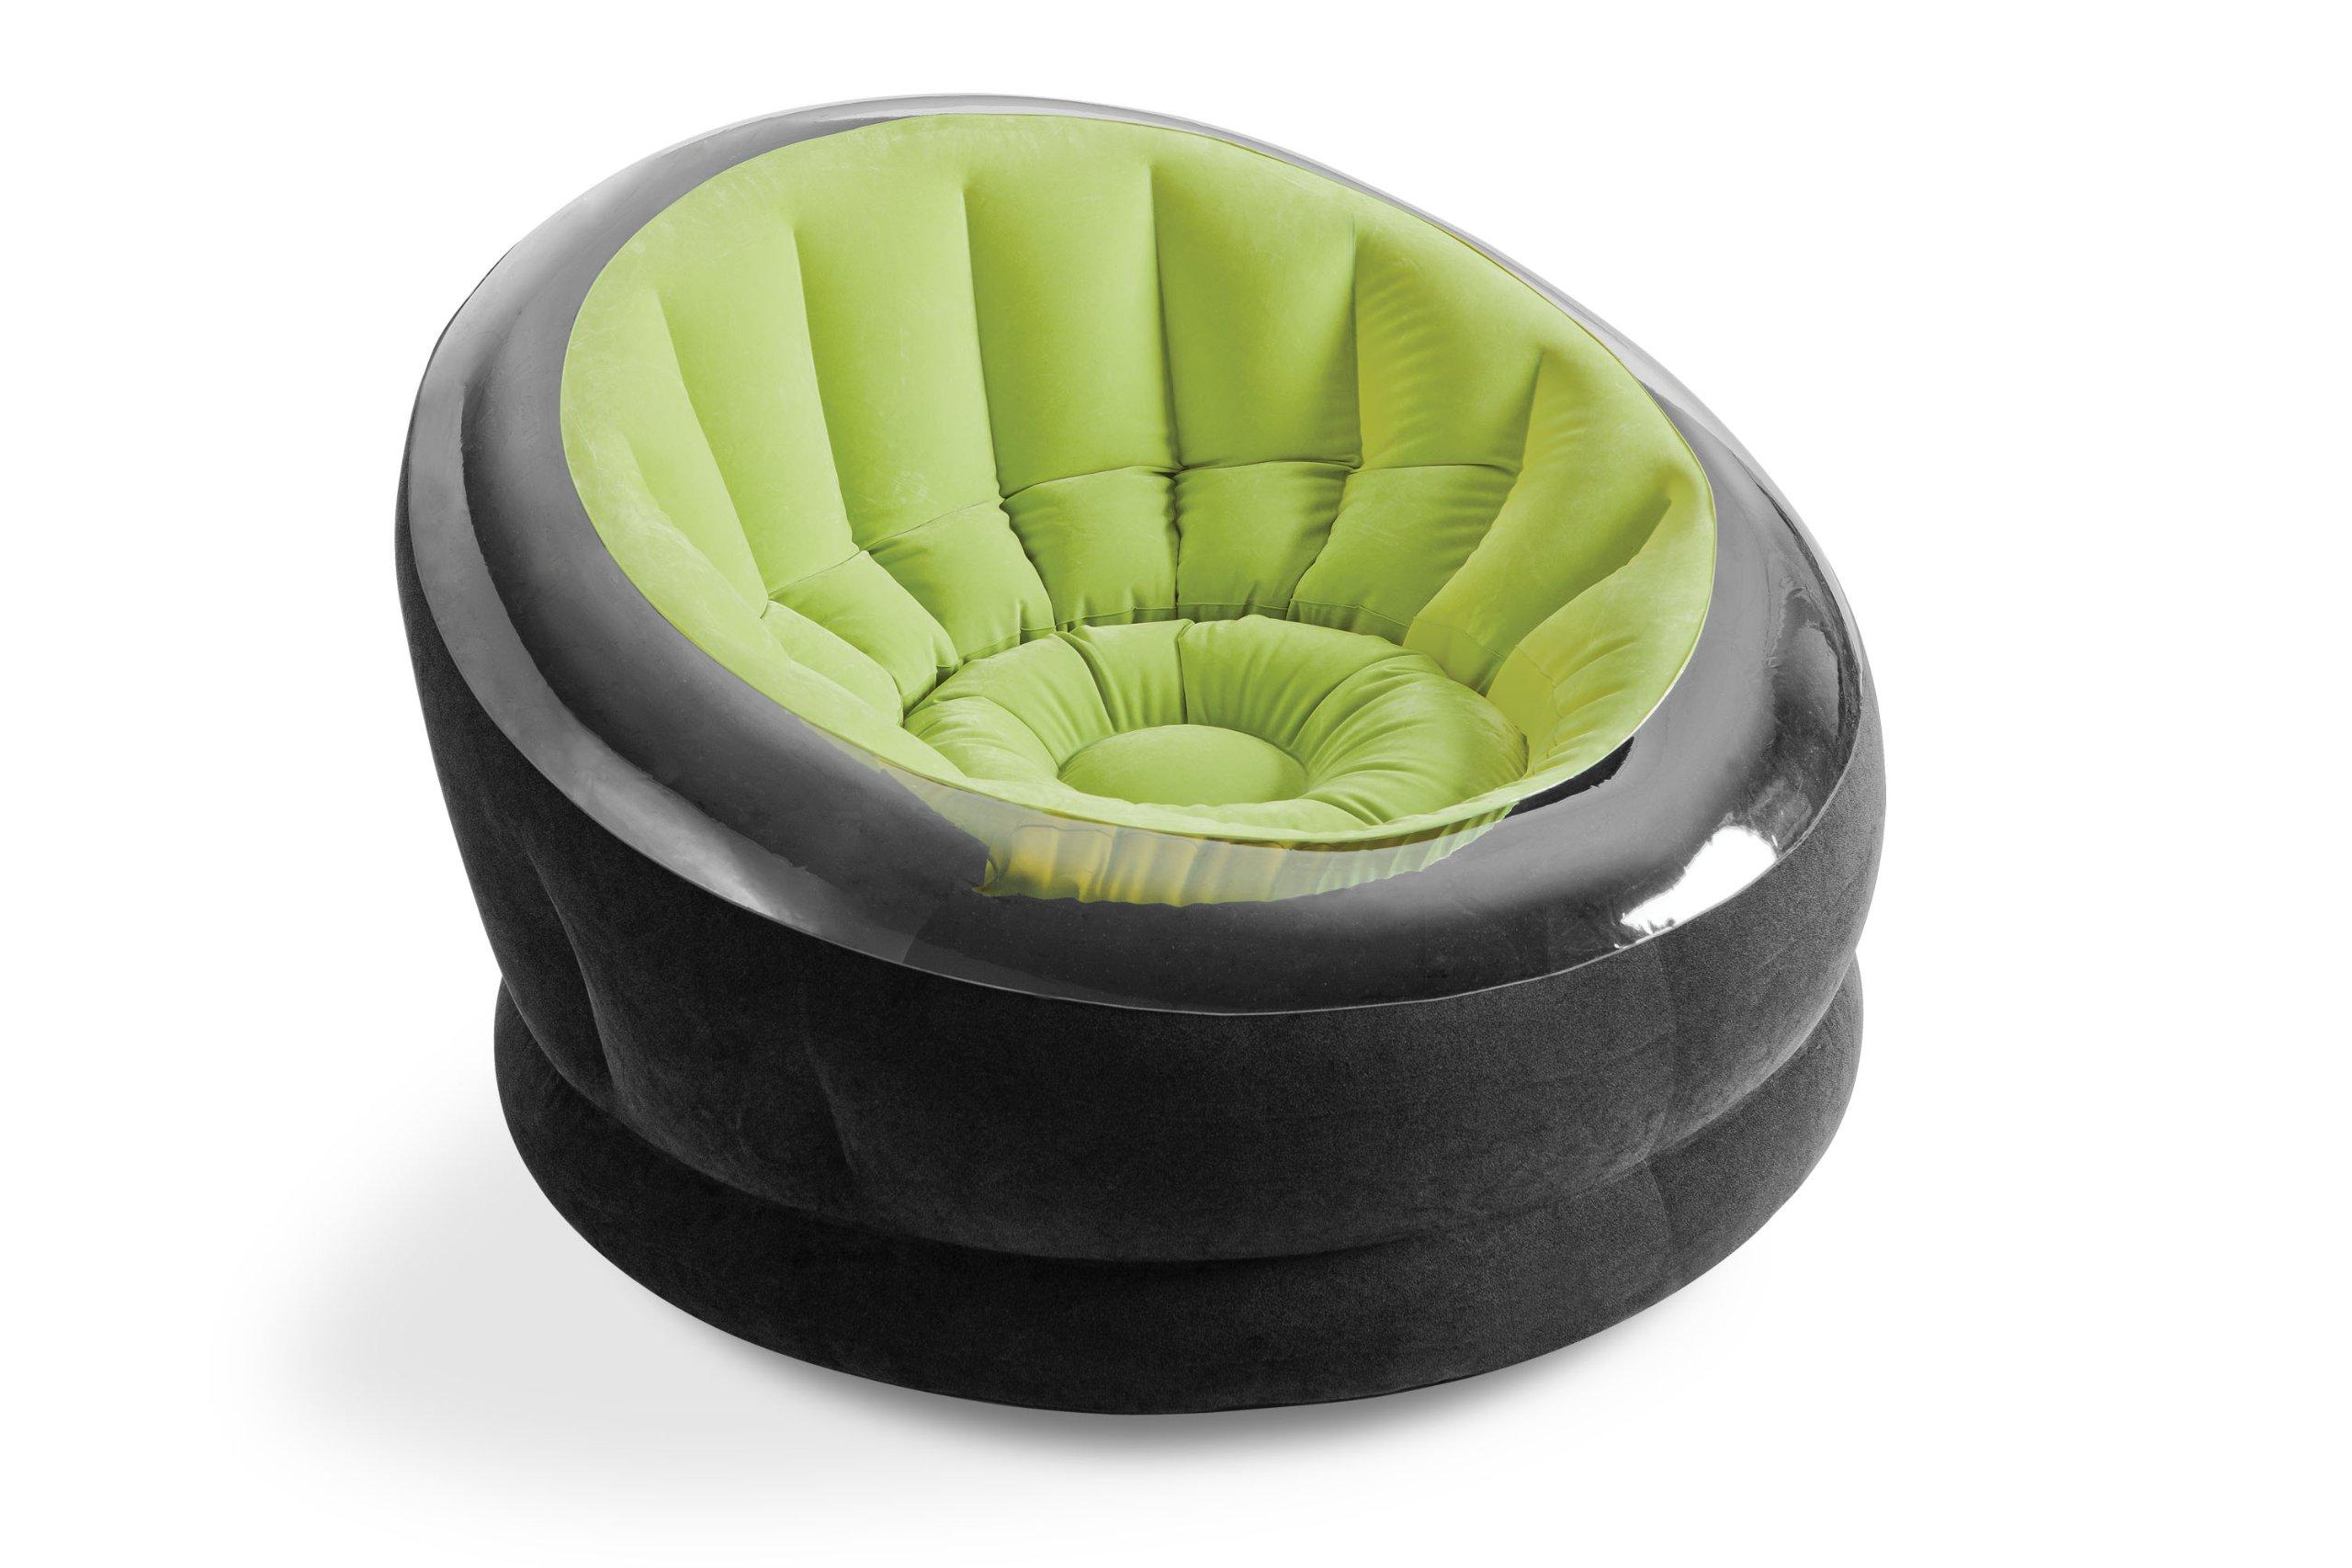 Intex Empire Inflatable Chair Green